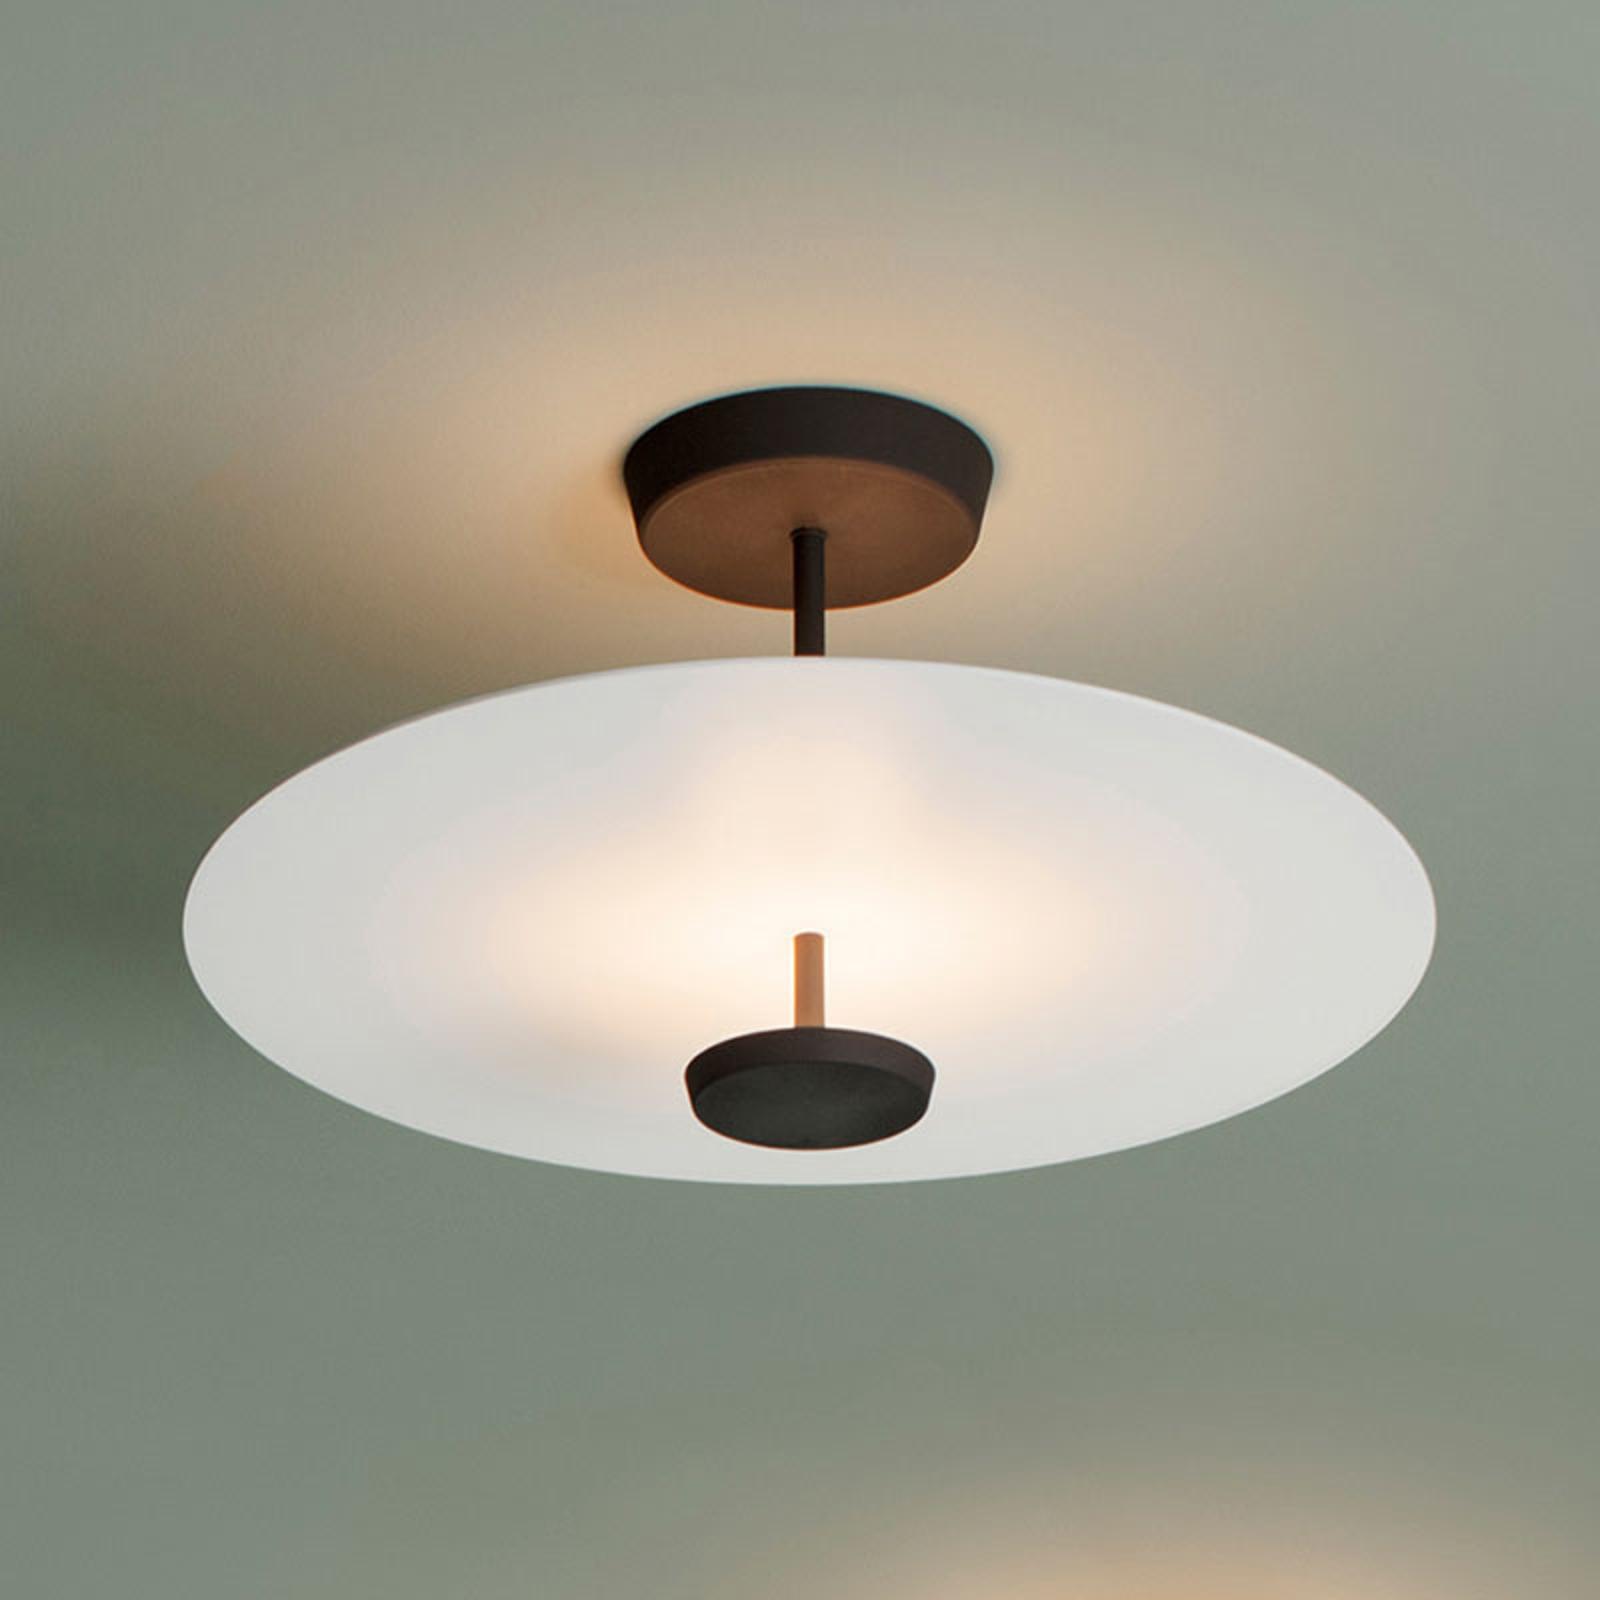 Vibia Flat LED-taklampe 2 lyskilder, Ø 55 cm hvit